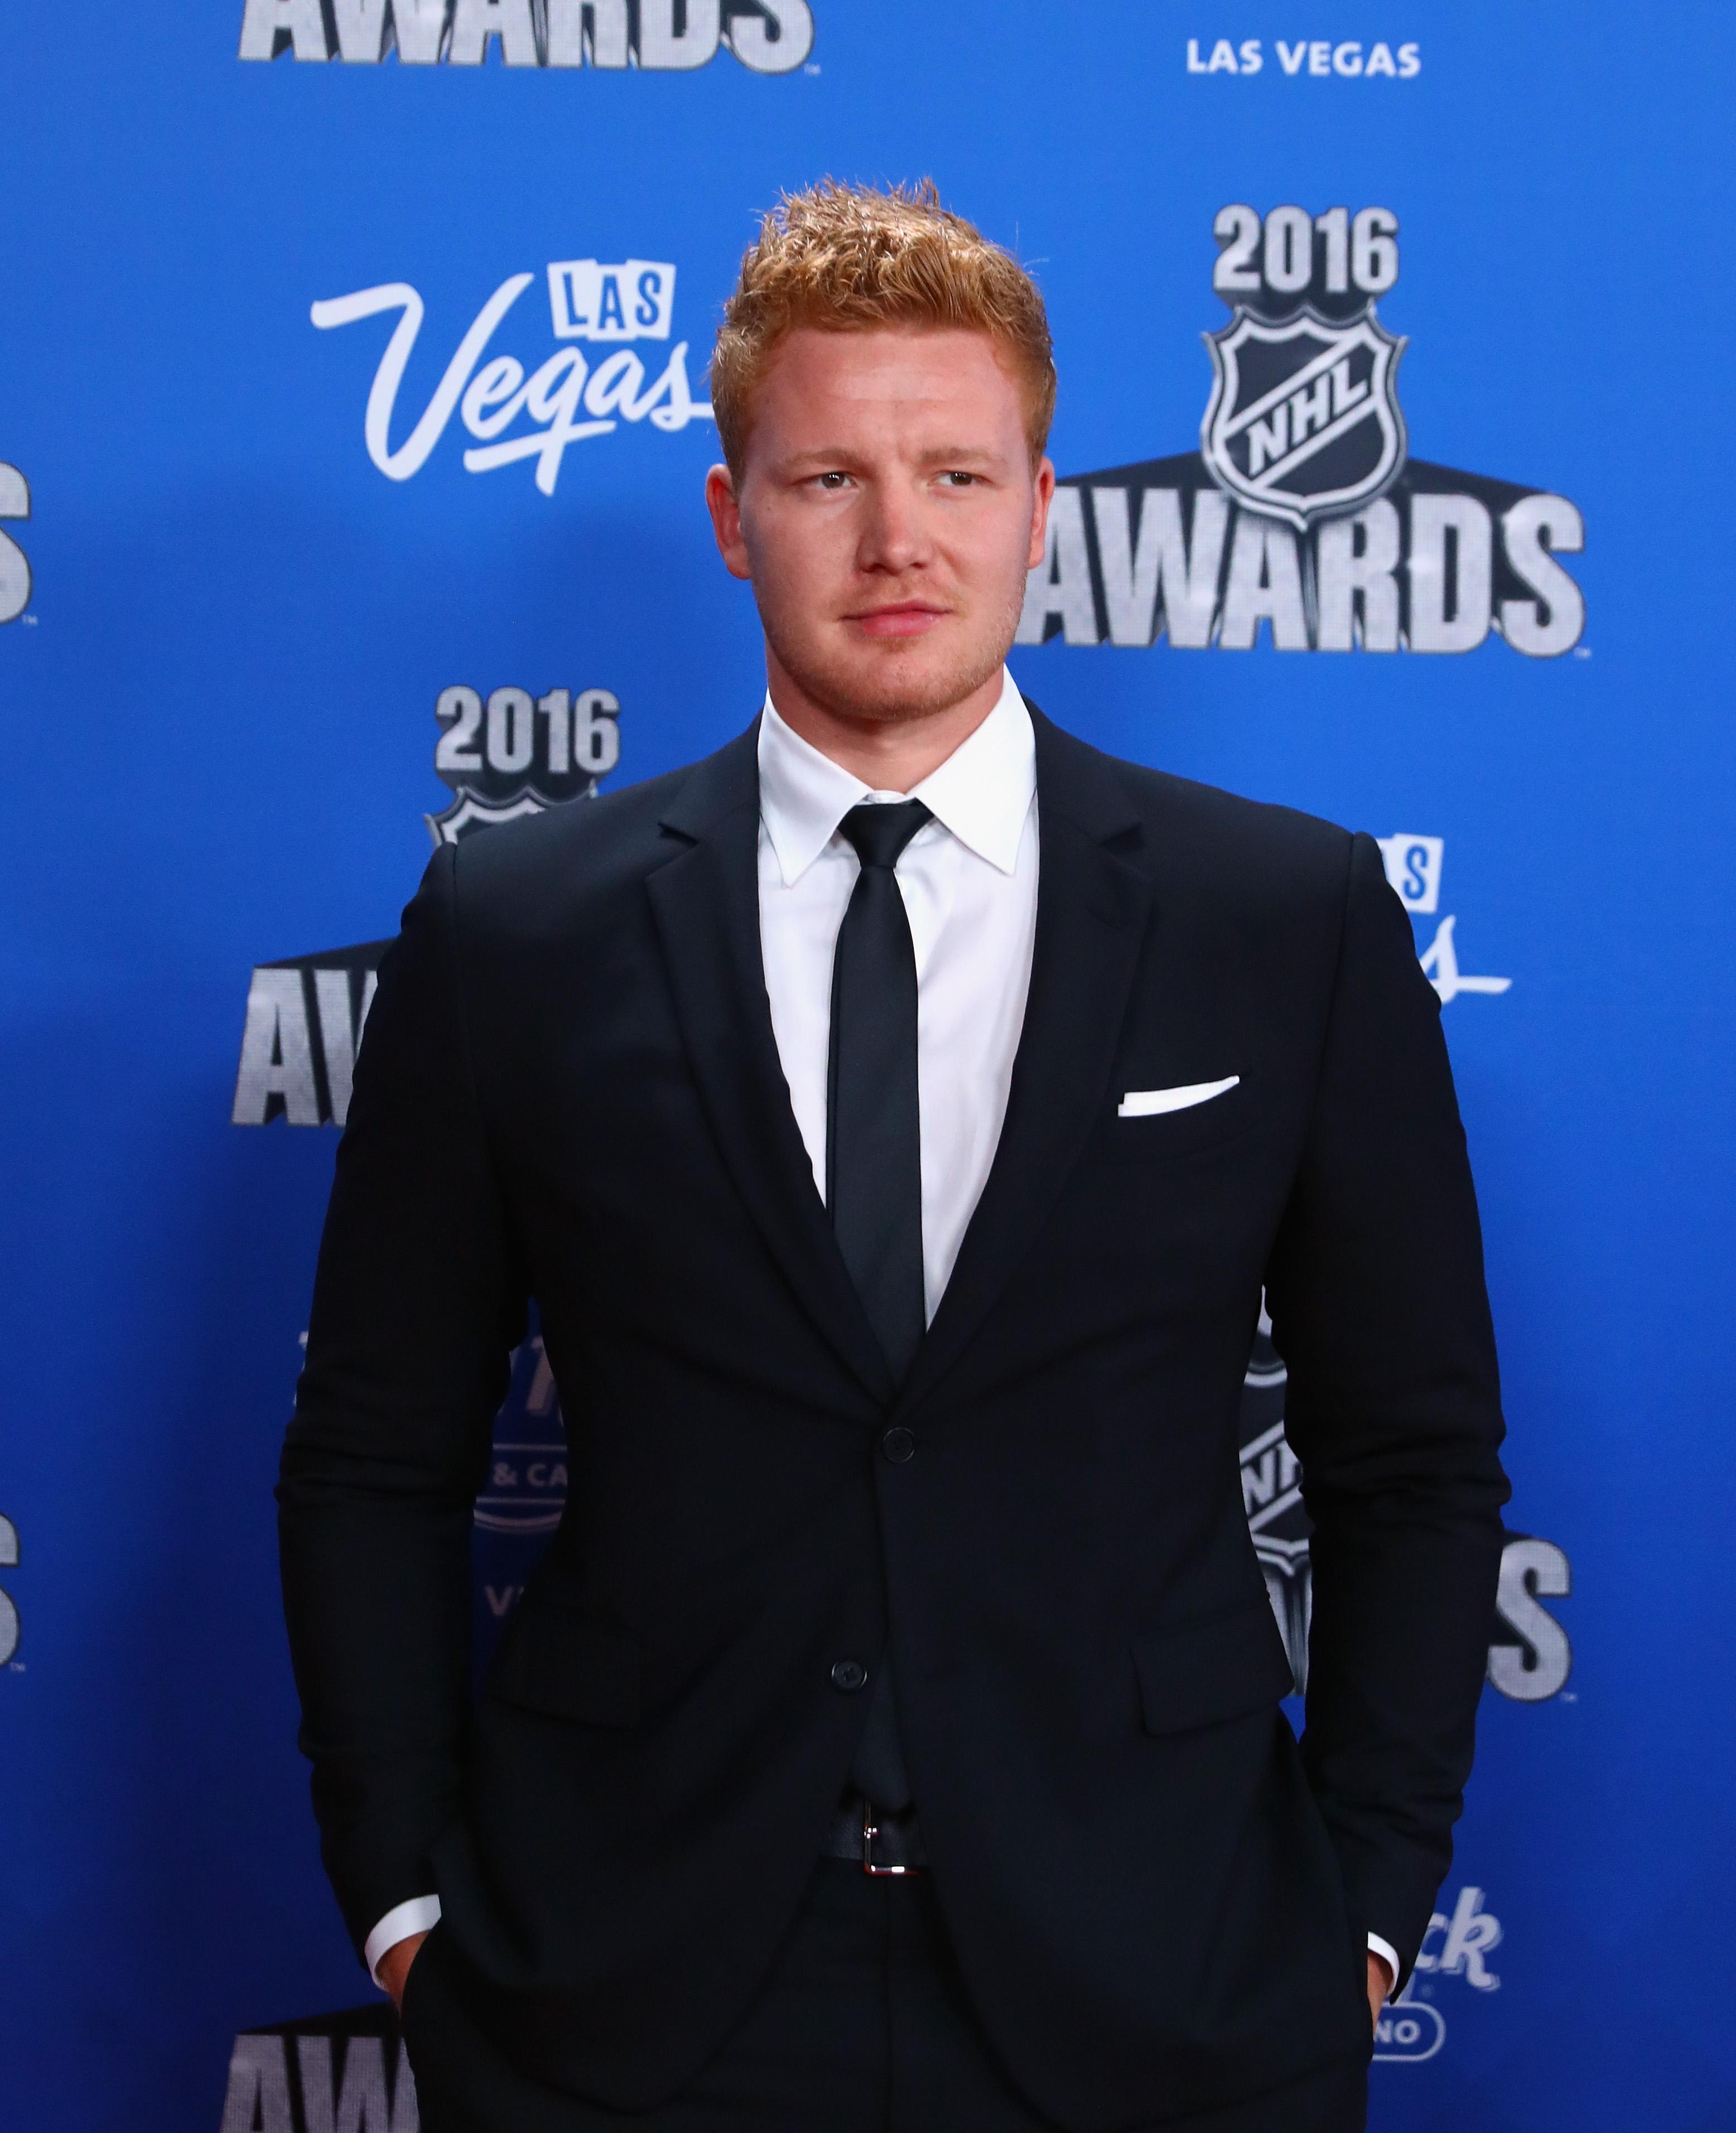 2016 NHL Awards - Red Carpet